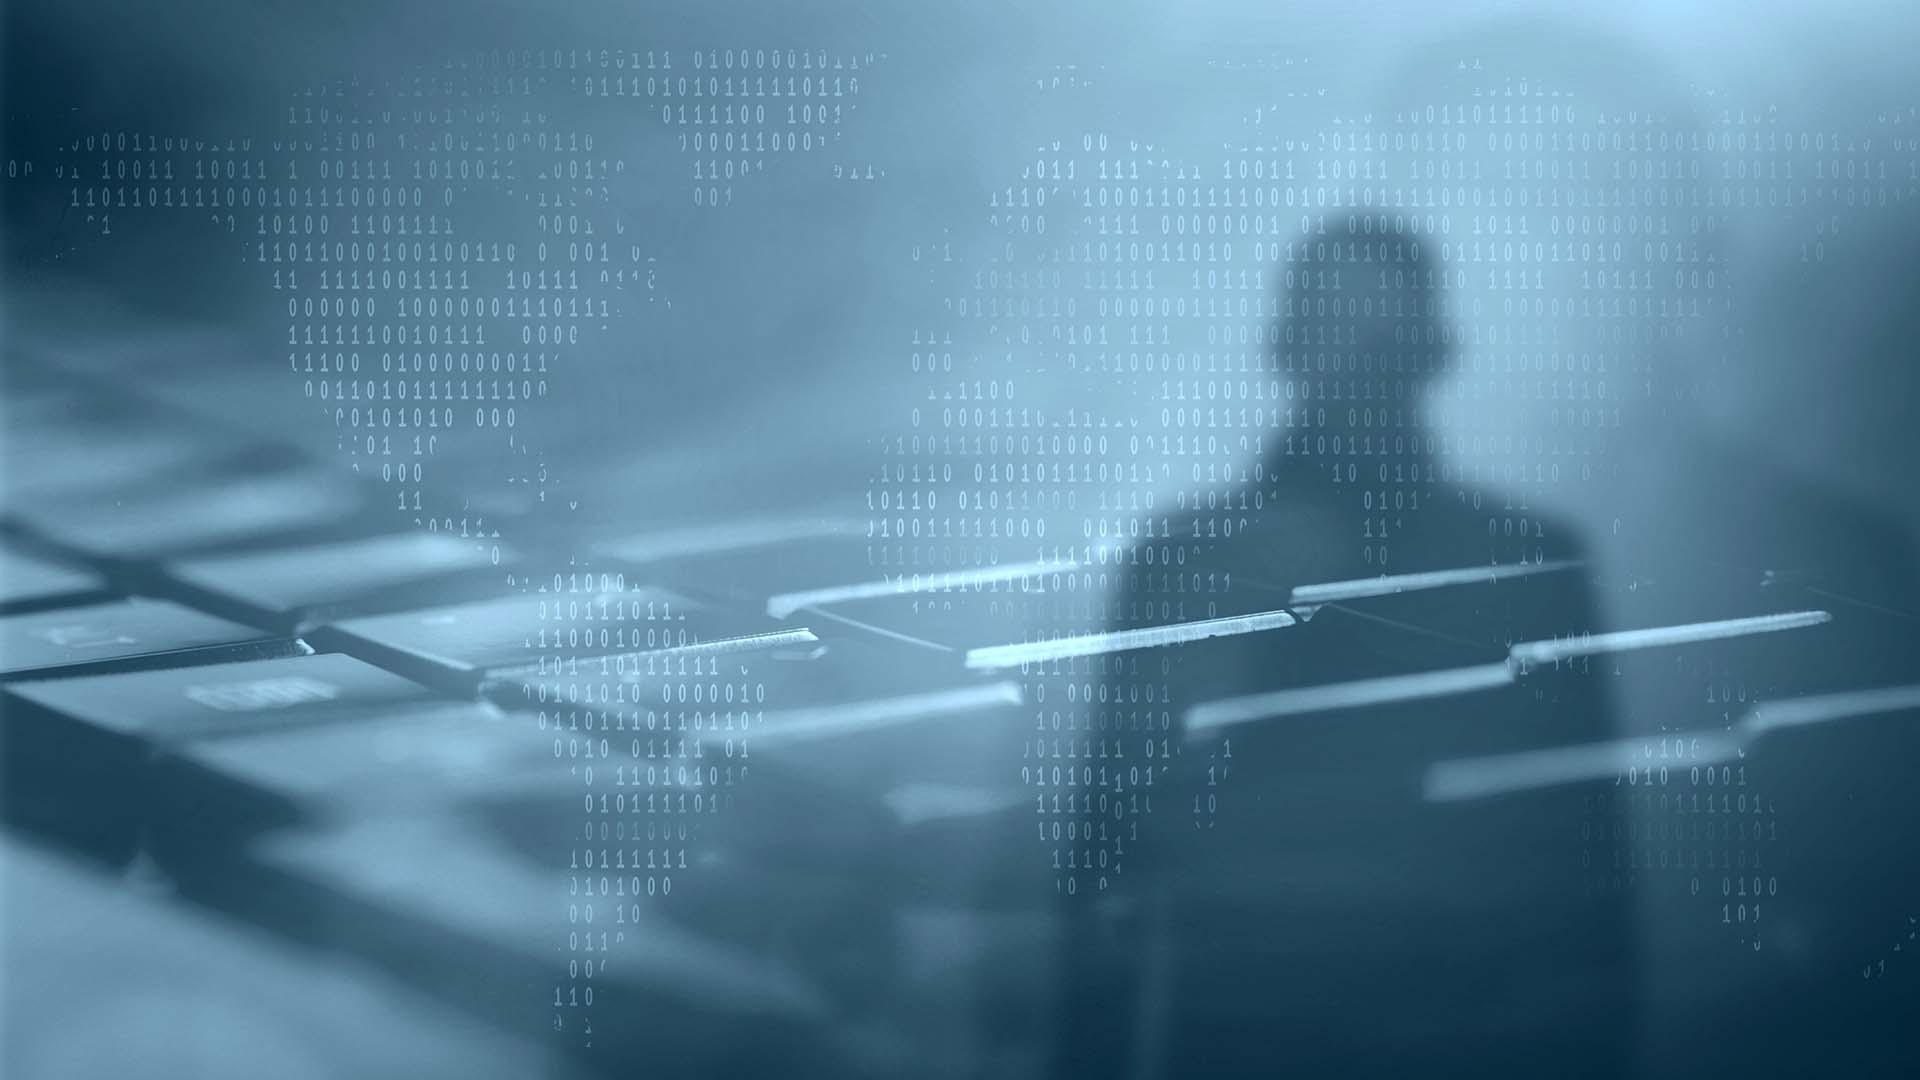 $17 Million in Bitcoin Seized in Dark Web Undercover Sting Operation